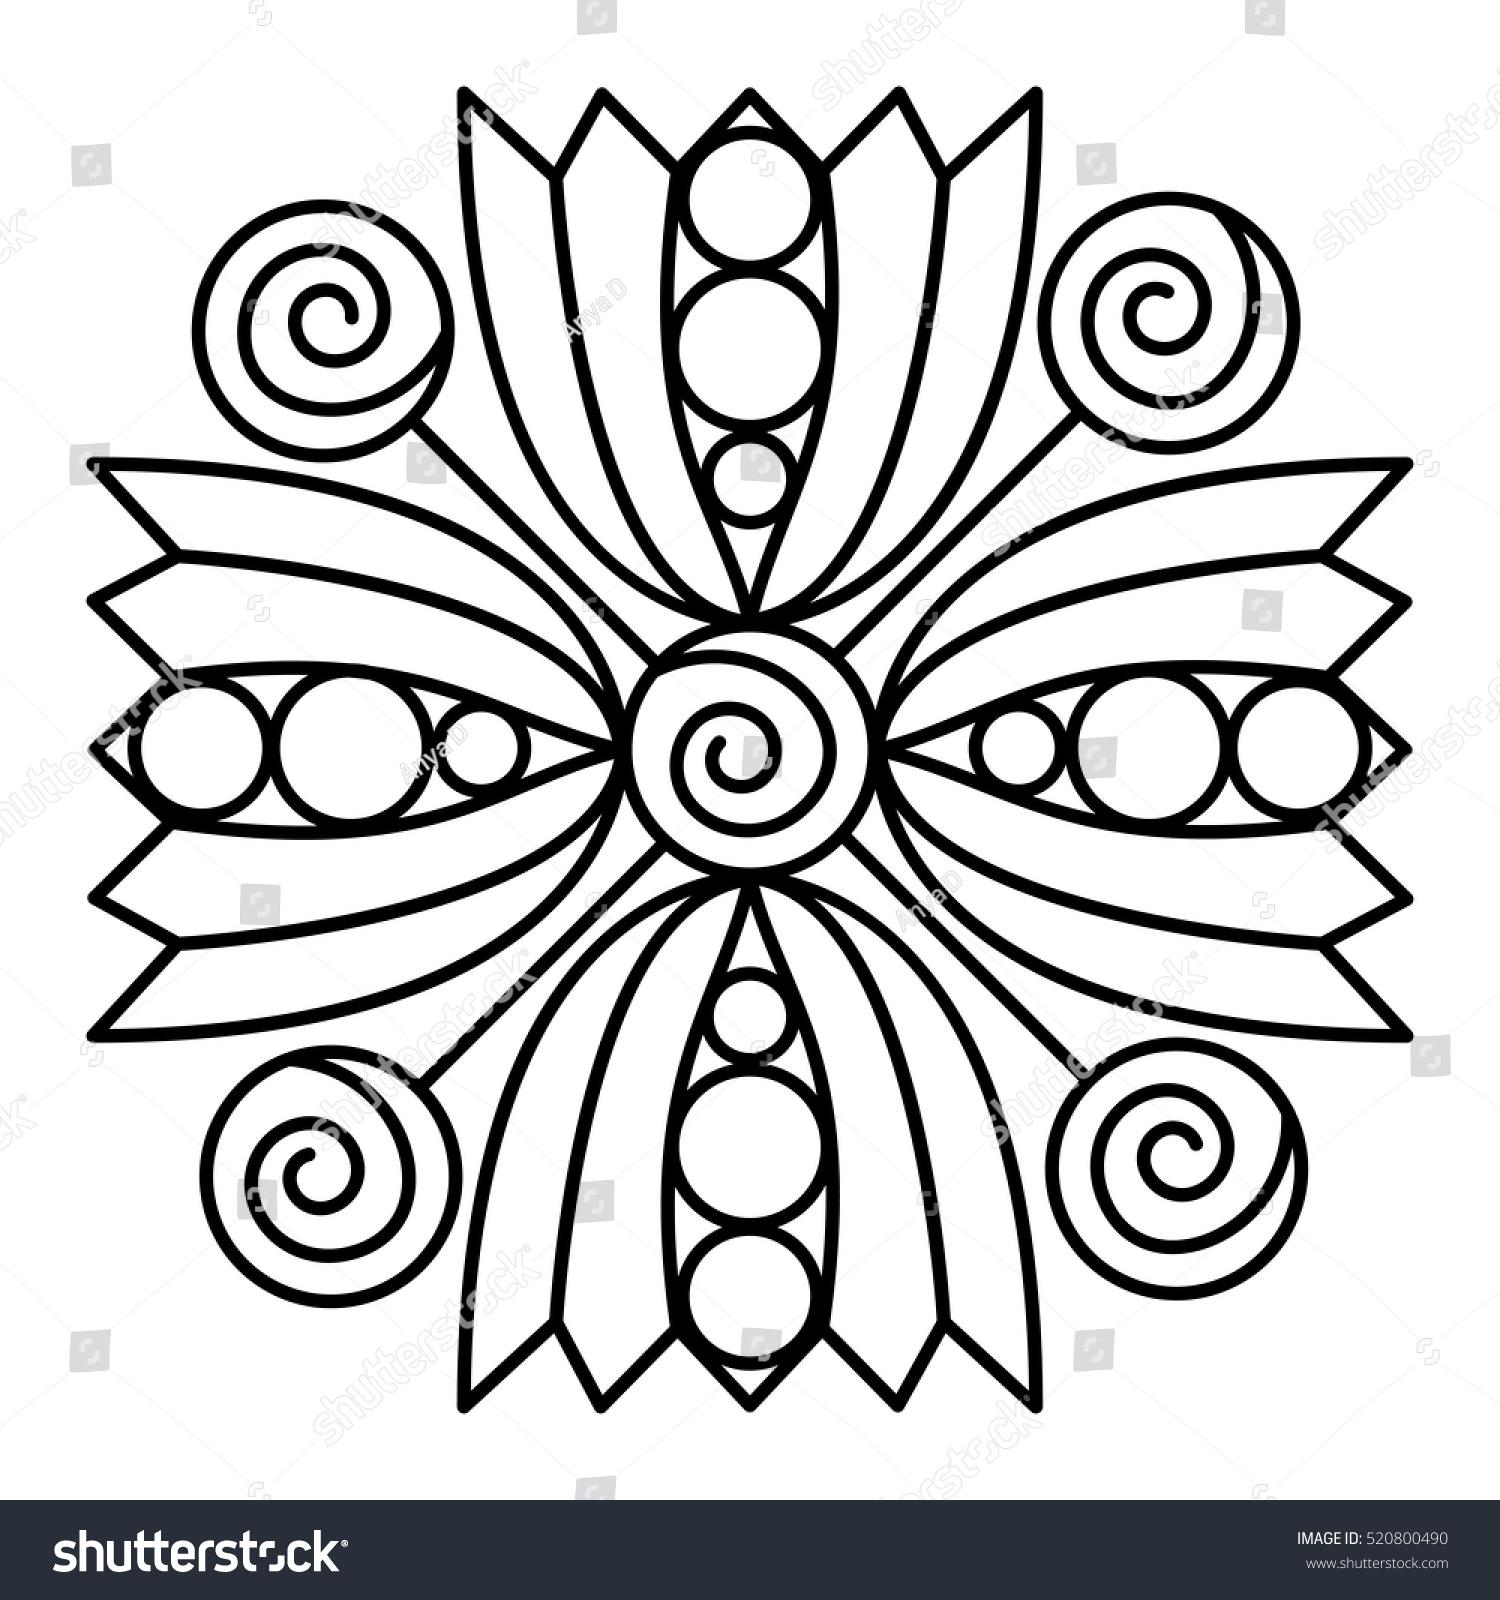 Geometric Shape Coloring Page Designs